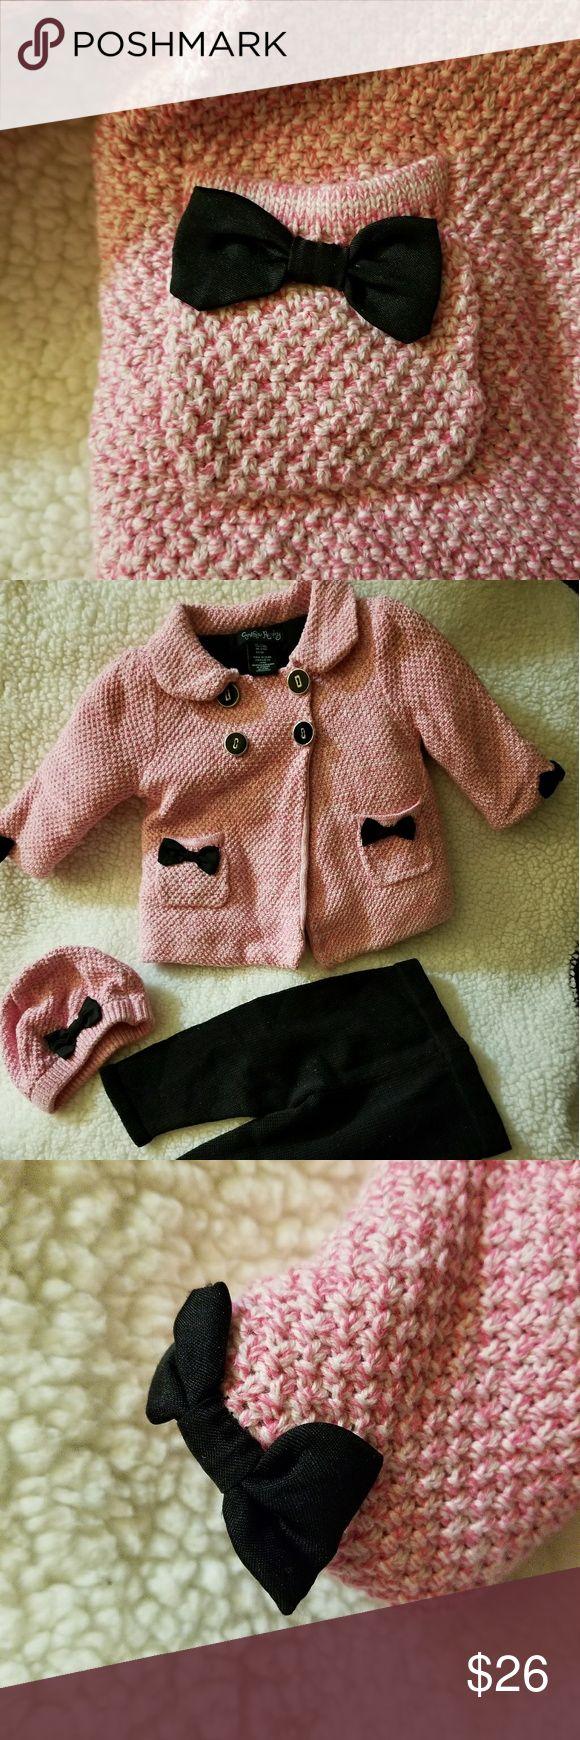 Pink/black pea coat set Very cute vintage look baby girls pea coat set. Cynthia Rowley Jackets & Coats Pea Coats